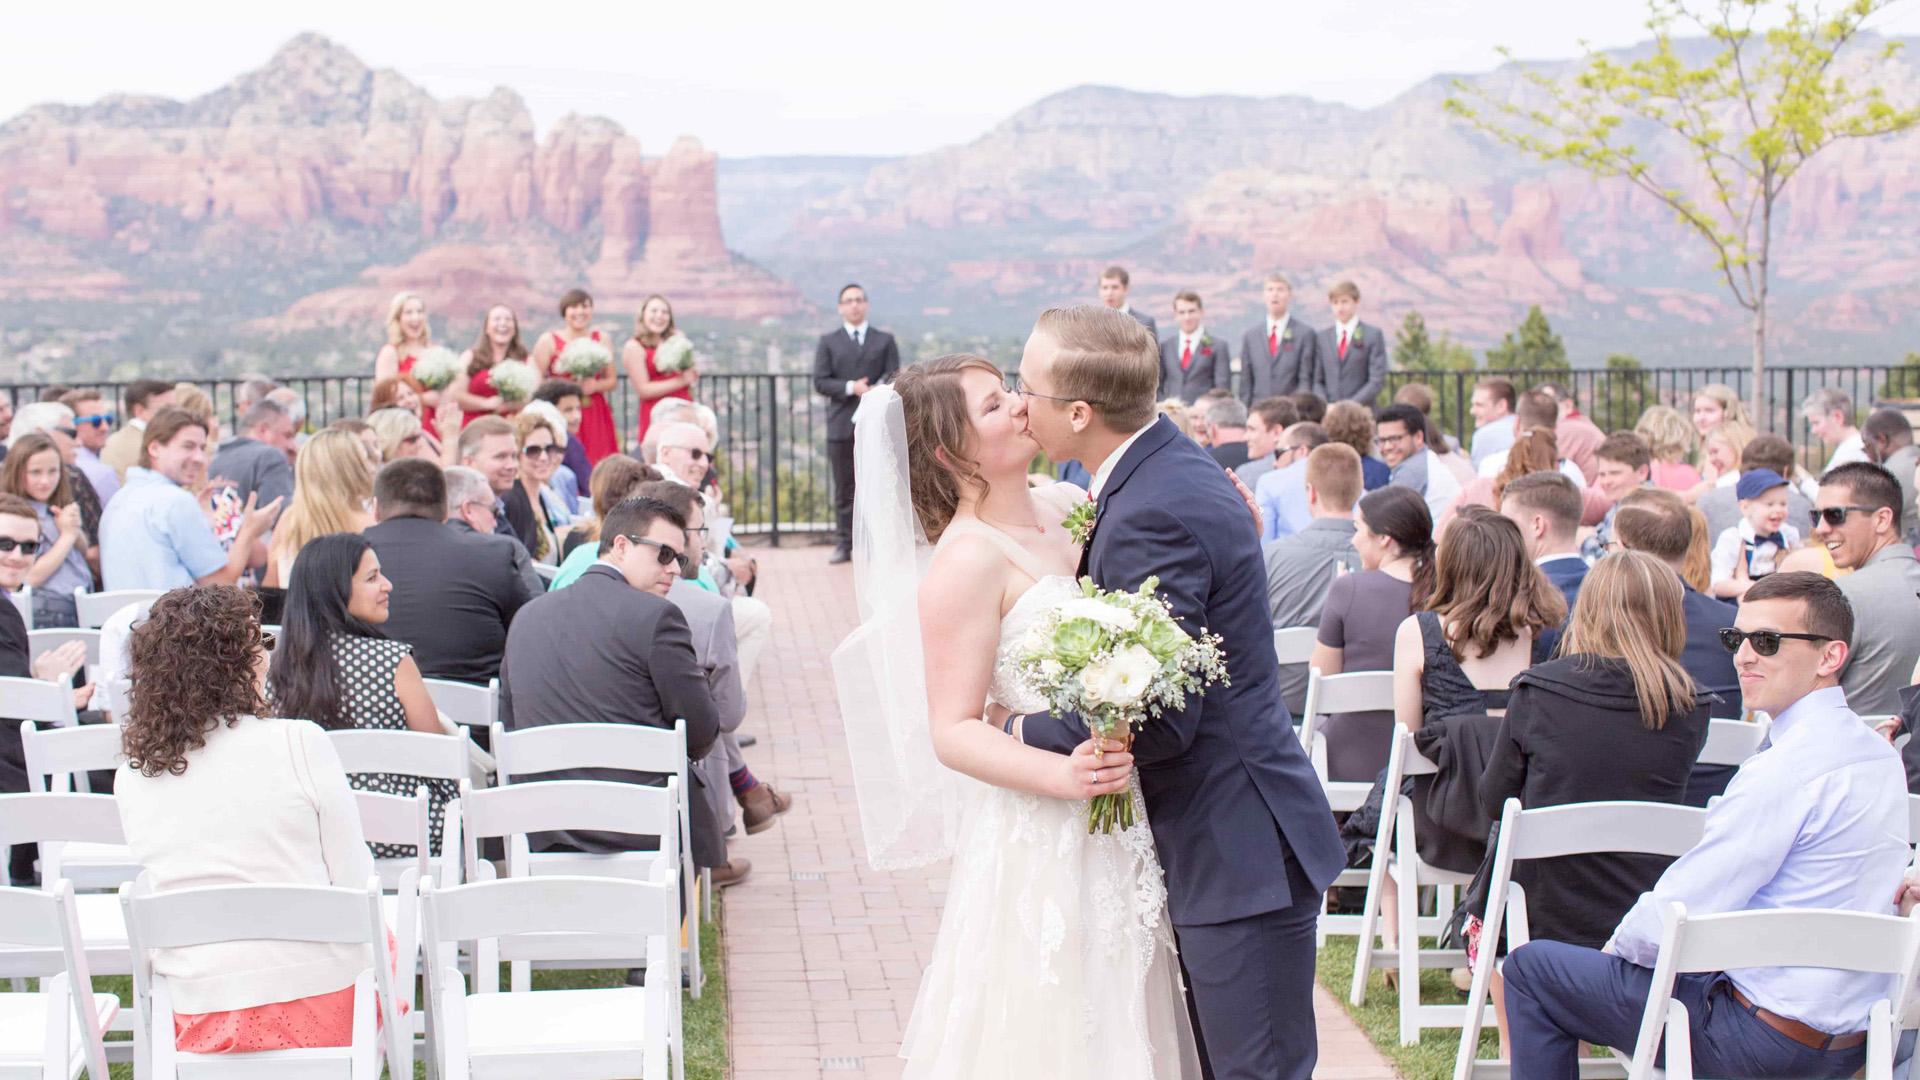 https://sedonaskyweddings.com/wp-content/uploads/2018/04/Sky-Ranch-Lodge-Wedding-Photo-Venue-Sedona-Arizona.jpg